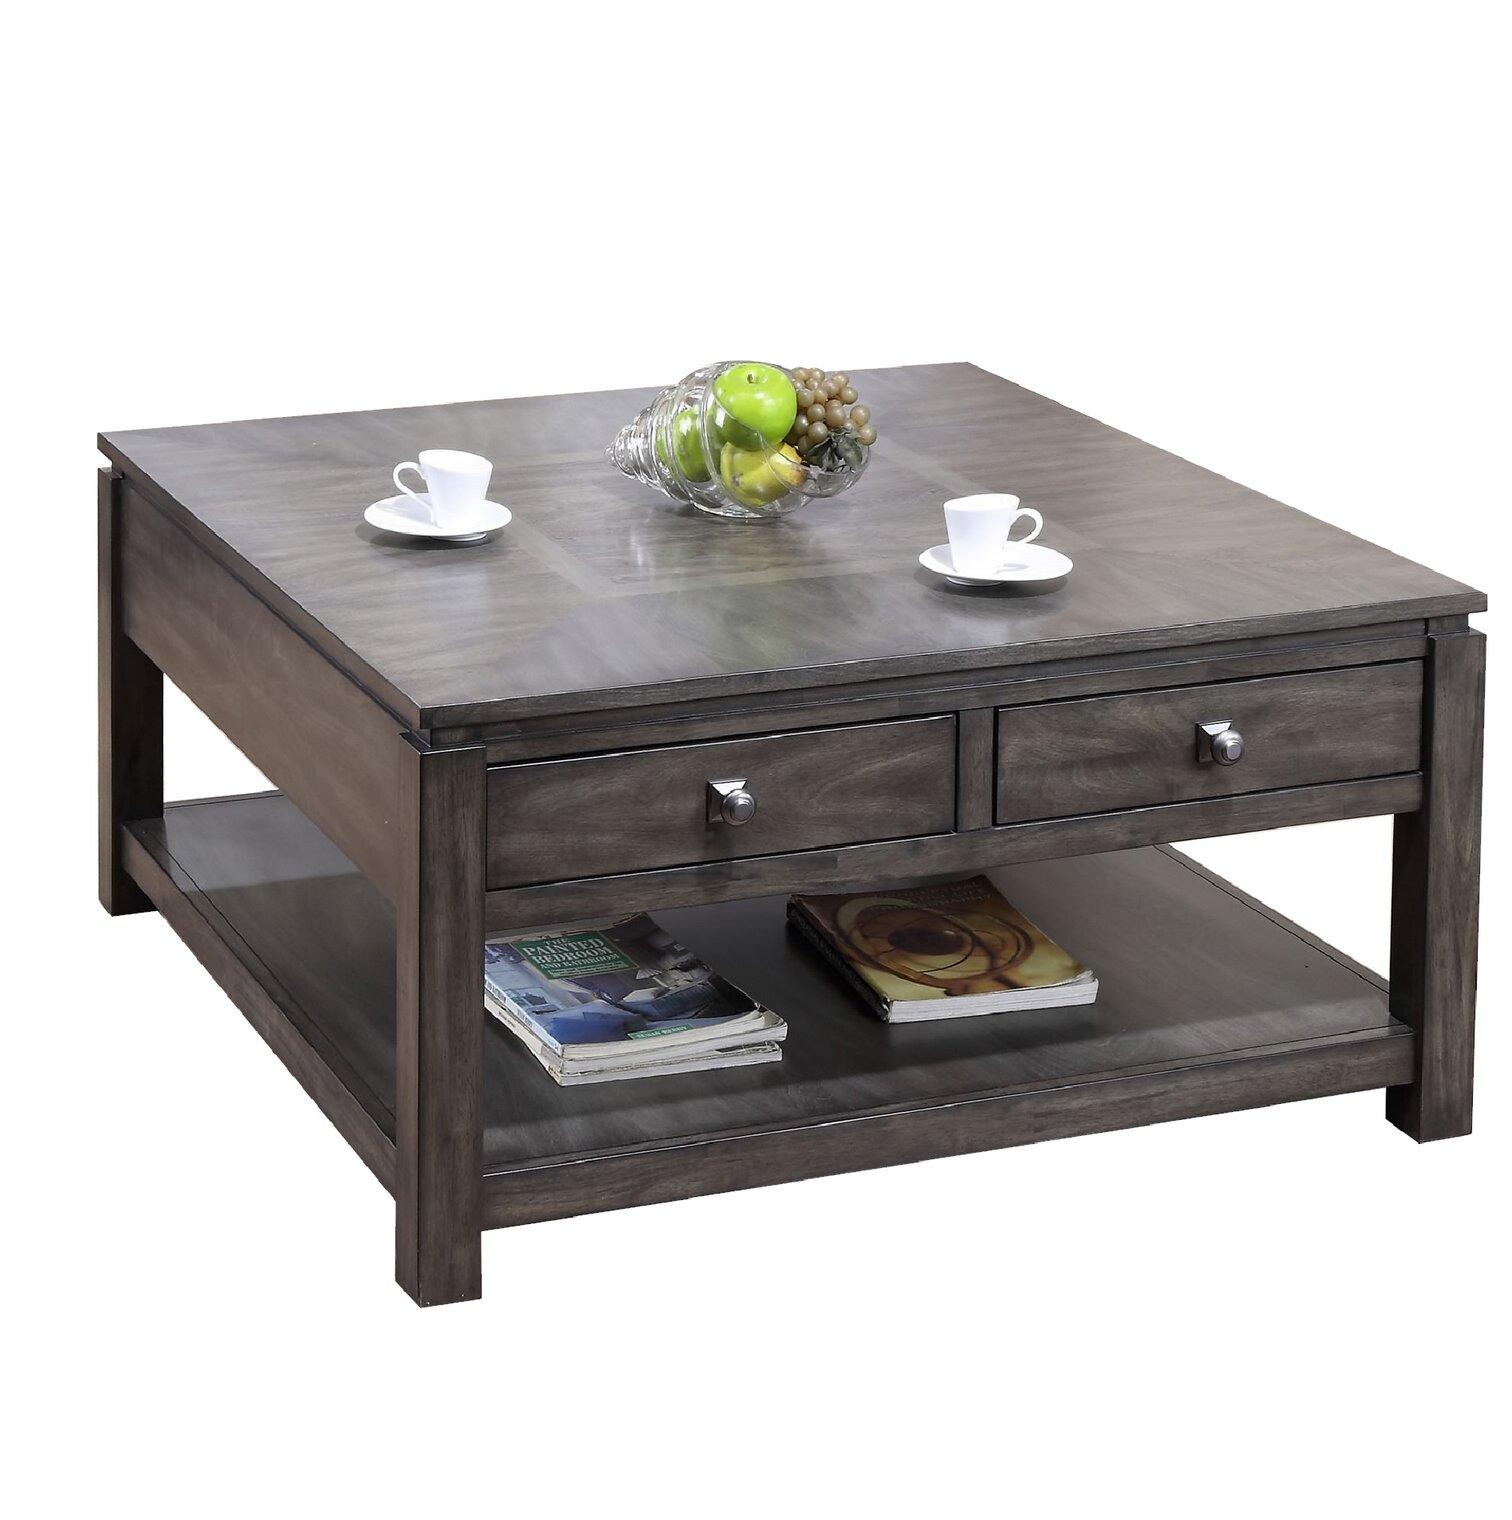 Loon Peak Orta Square Coffee Table